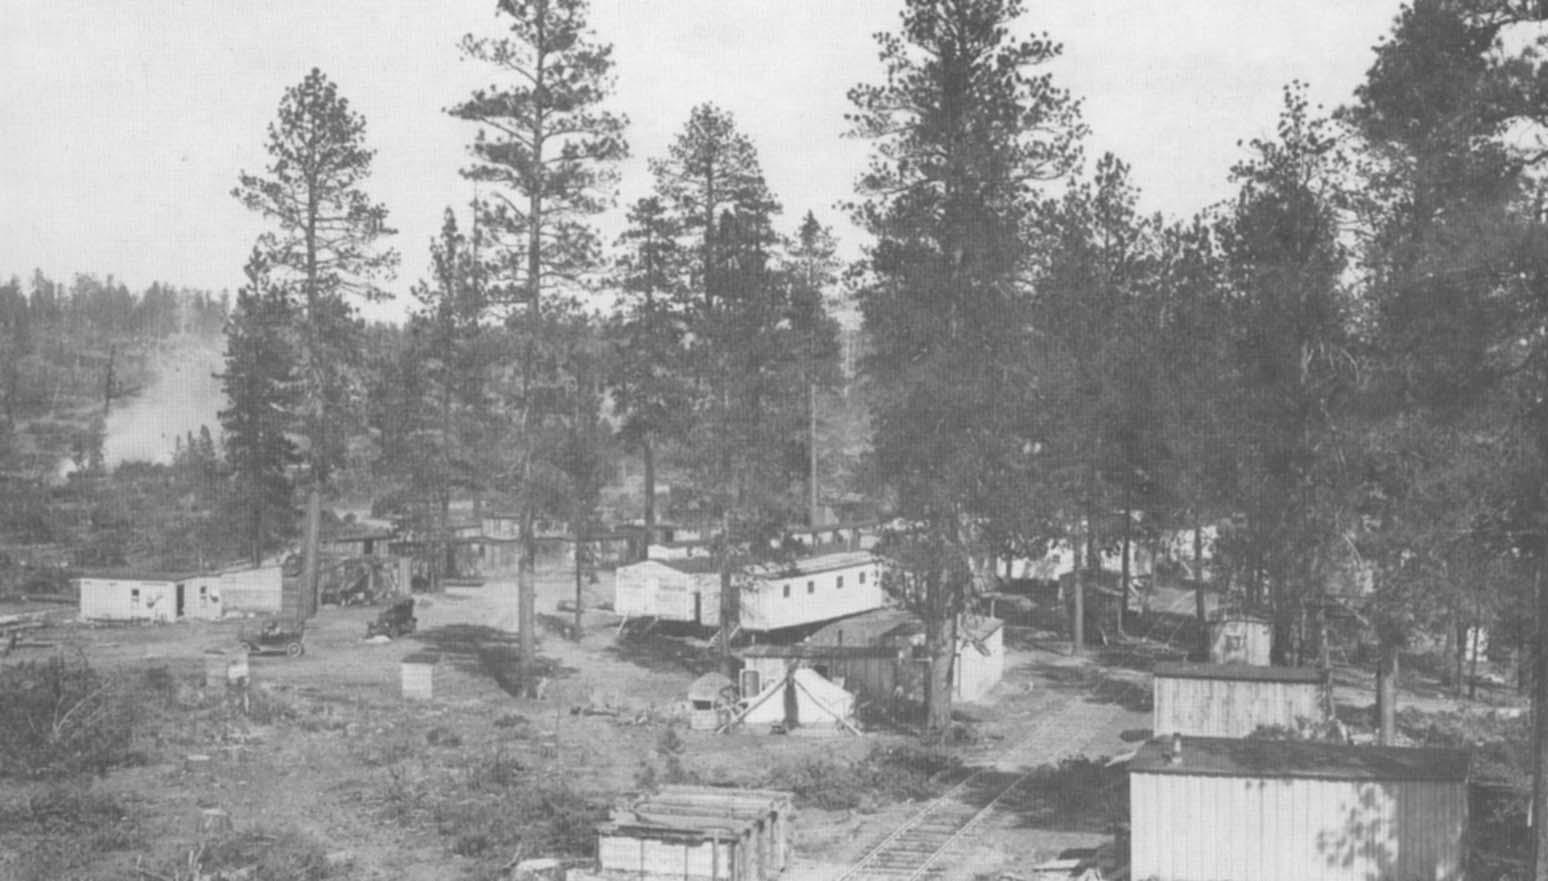 A Portable Railroad Logging Town